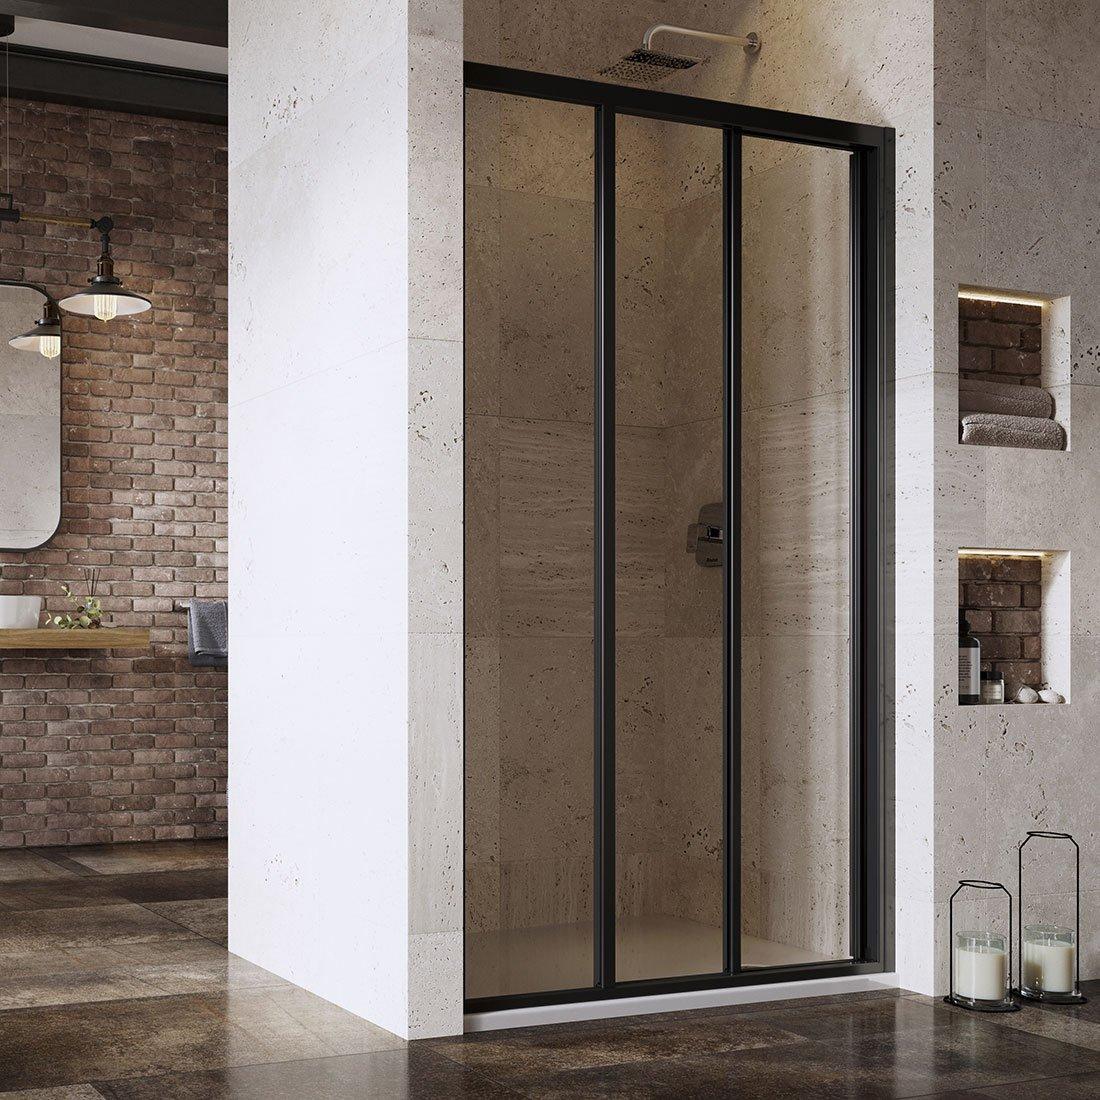 ASDP3-90 198 (Transparent) Black Душевая дверь